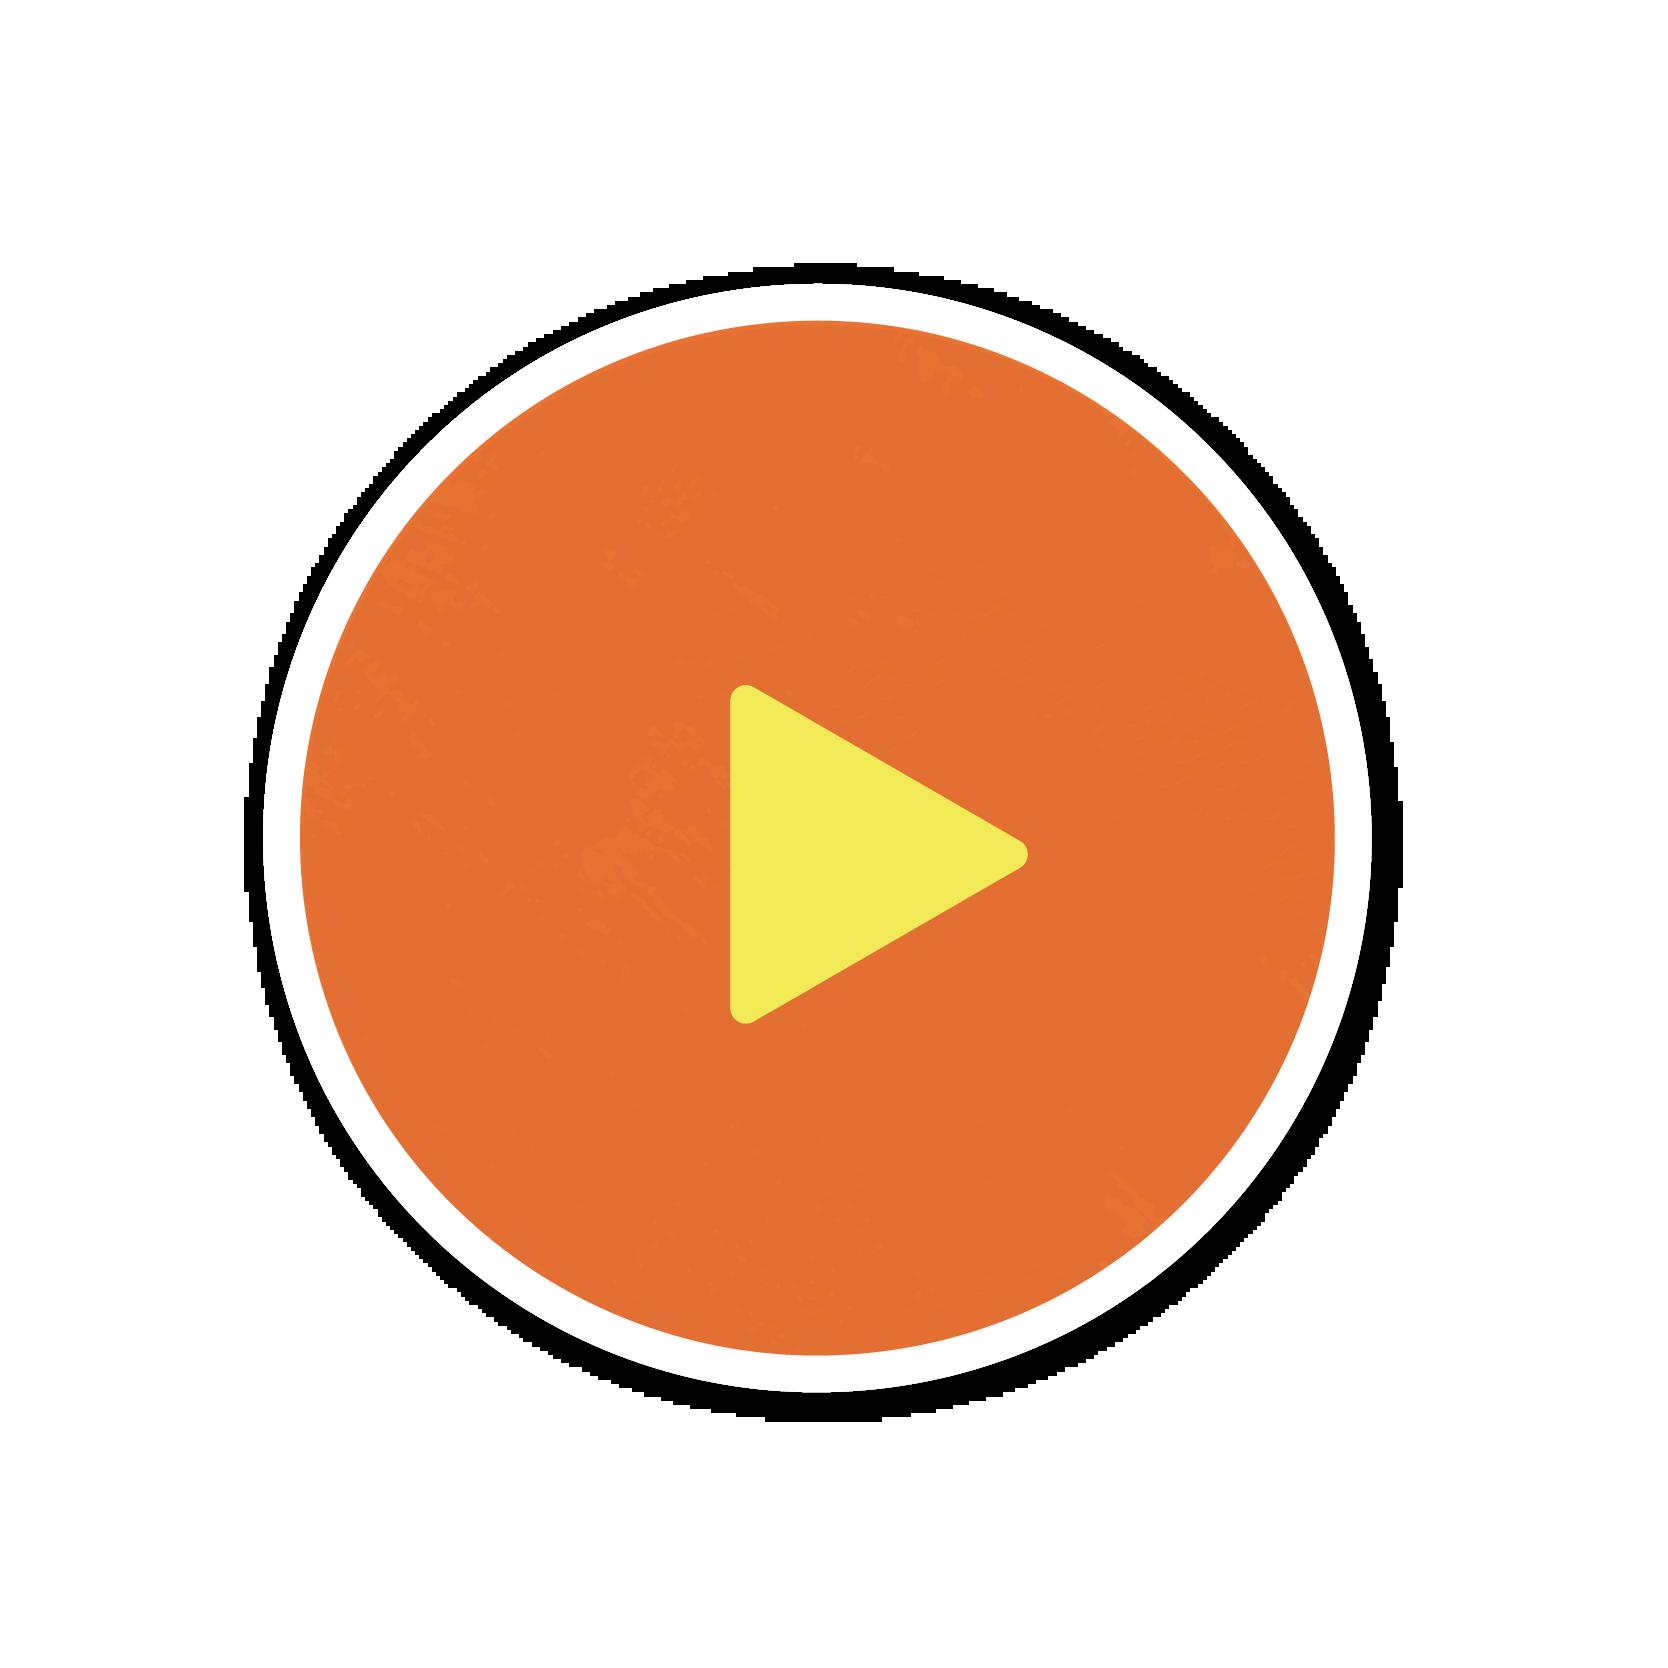 An orange play button